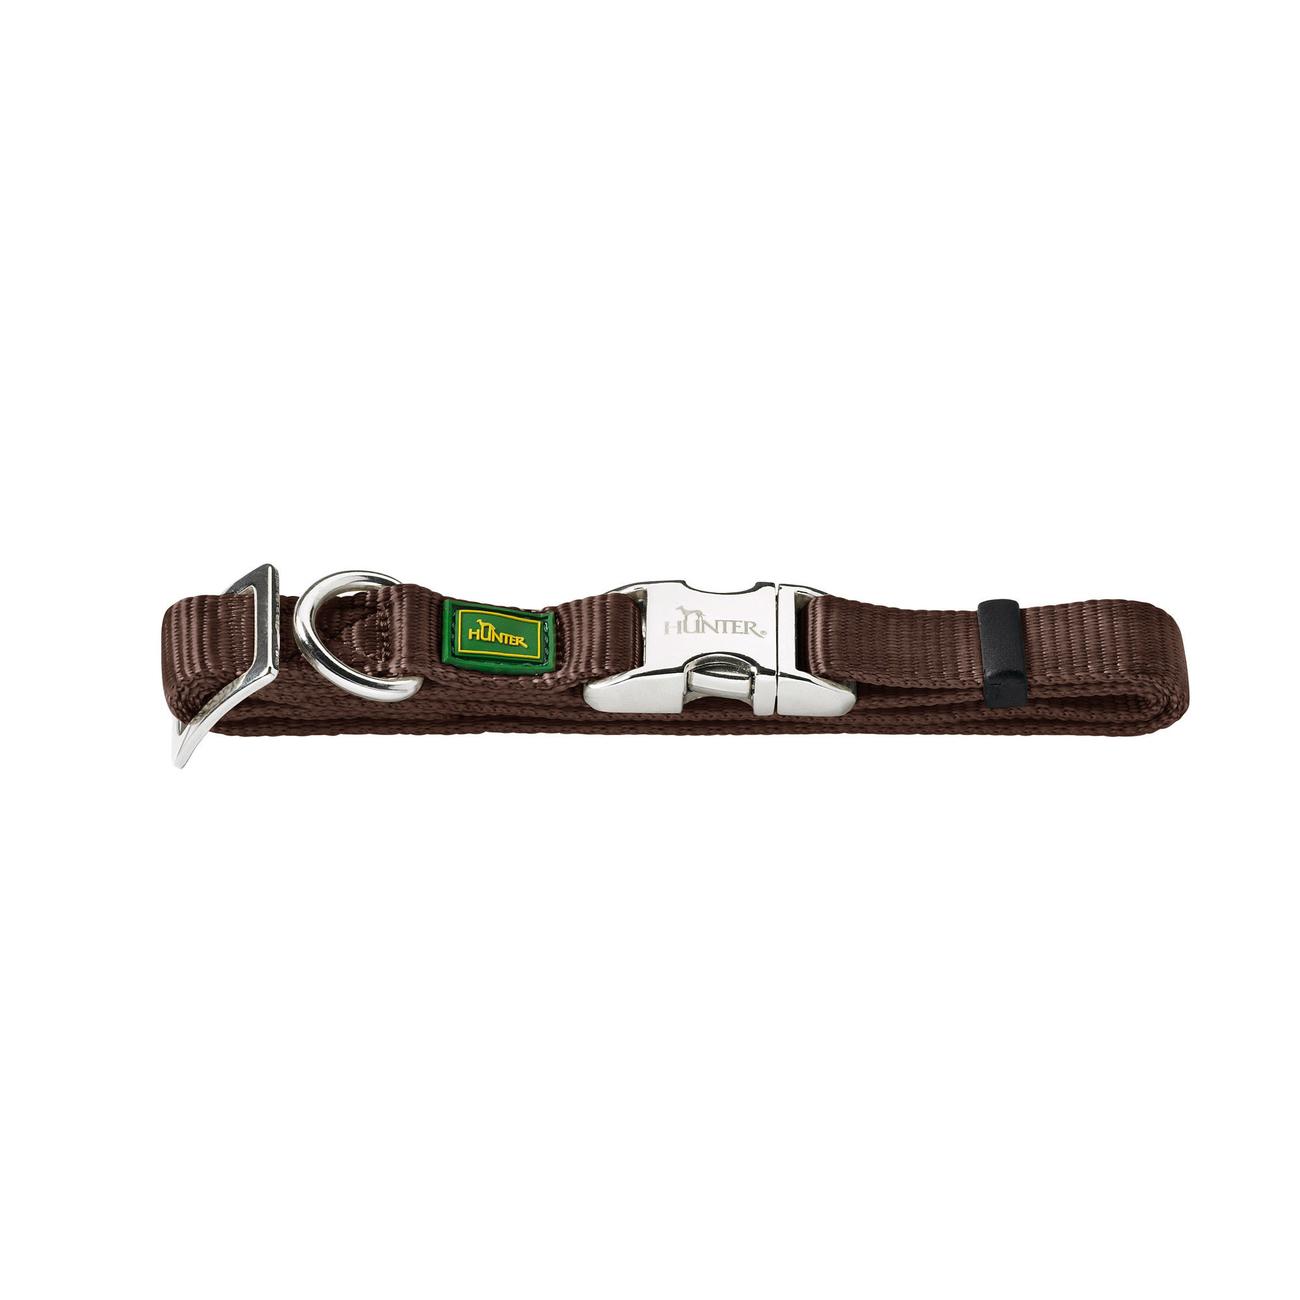 Hunter Halsband Vario Basic Alu Strong Verschluss 46668, Bild 5